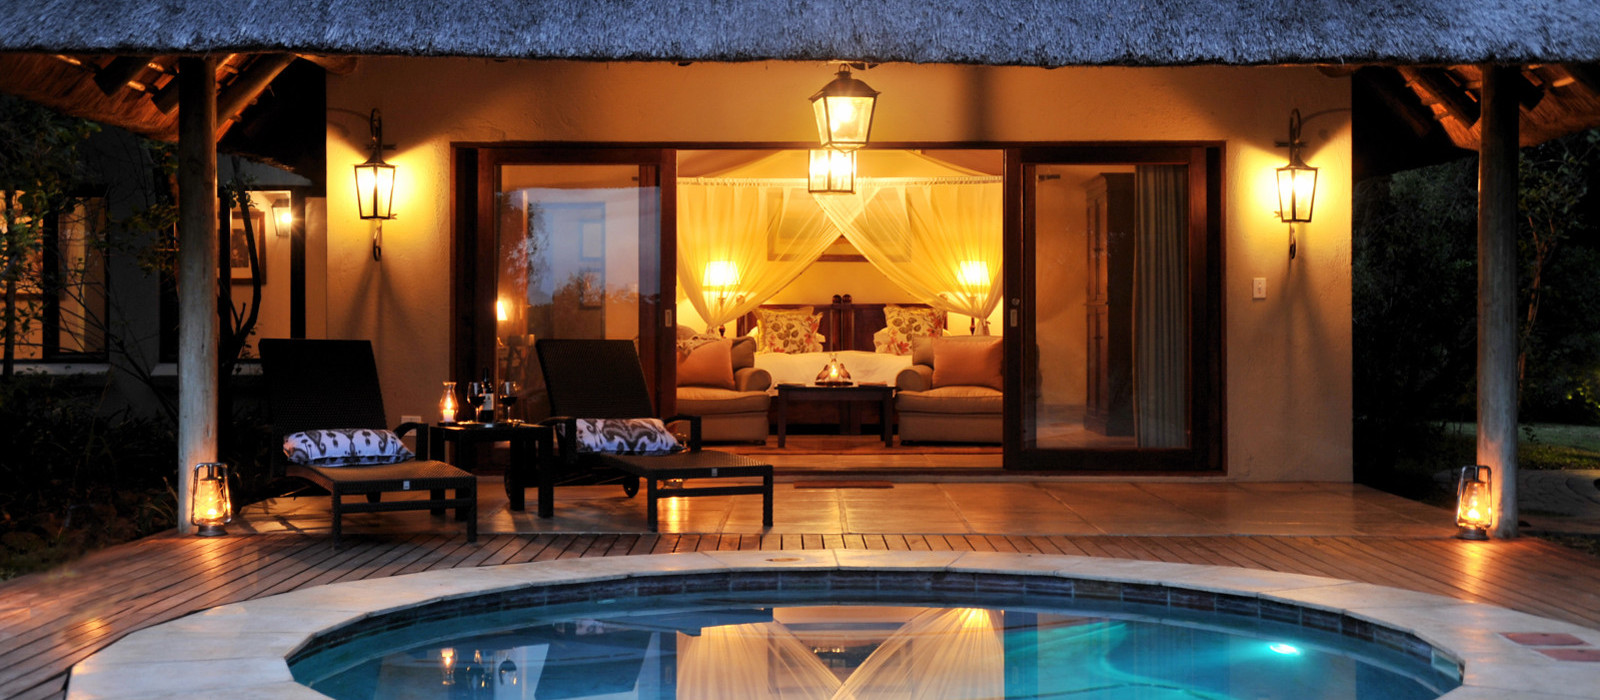 Hotel Savanna Private Game Reserve South Africa